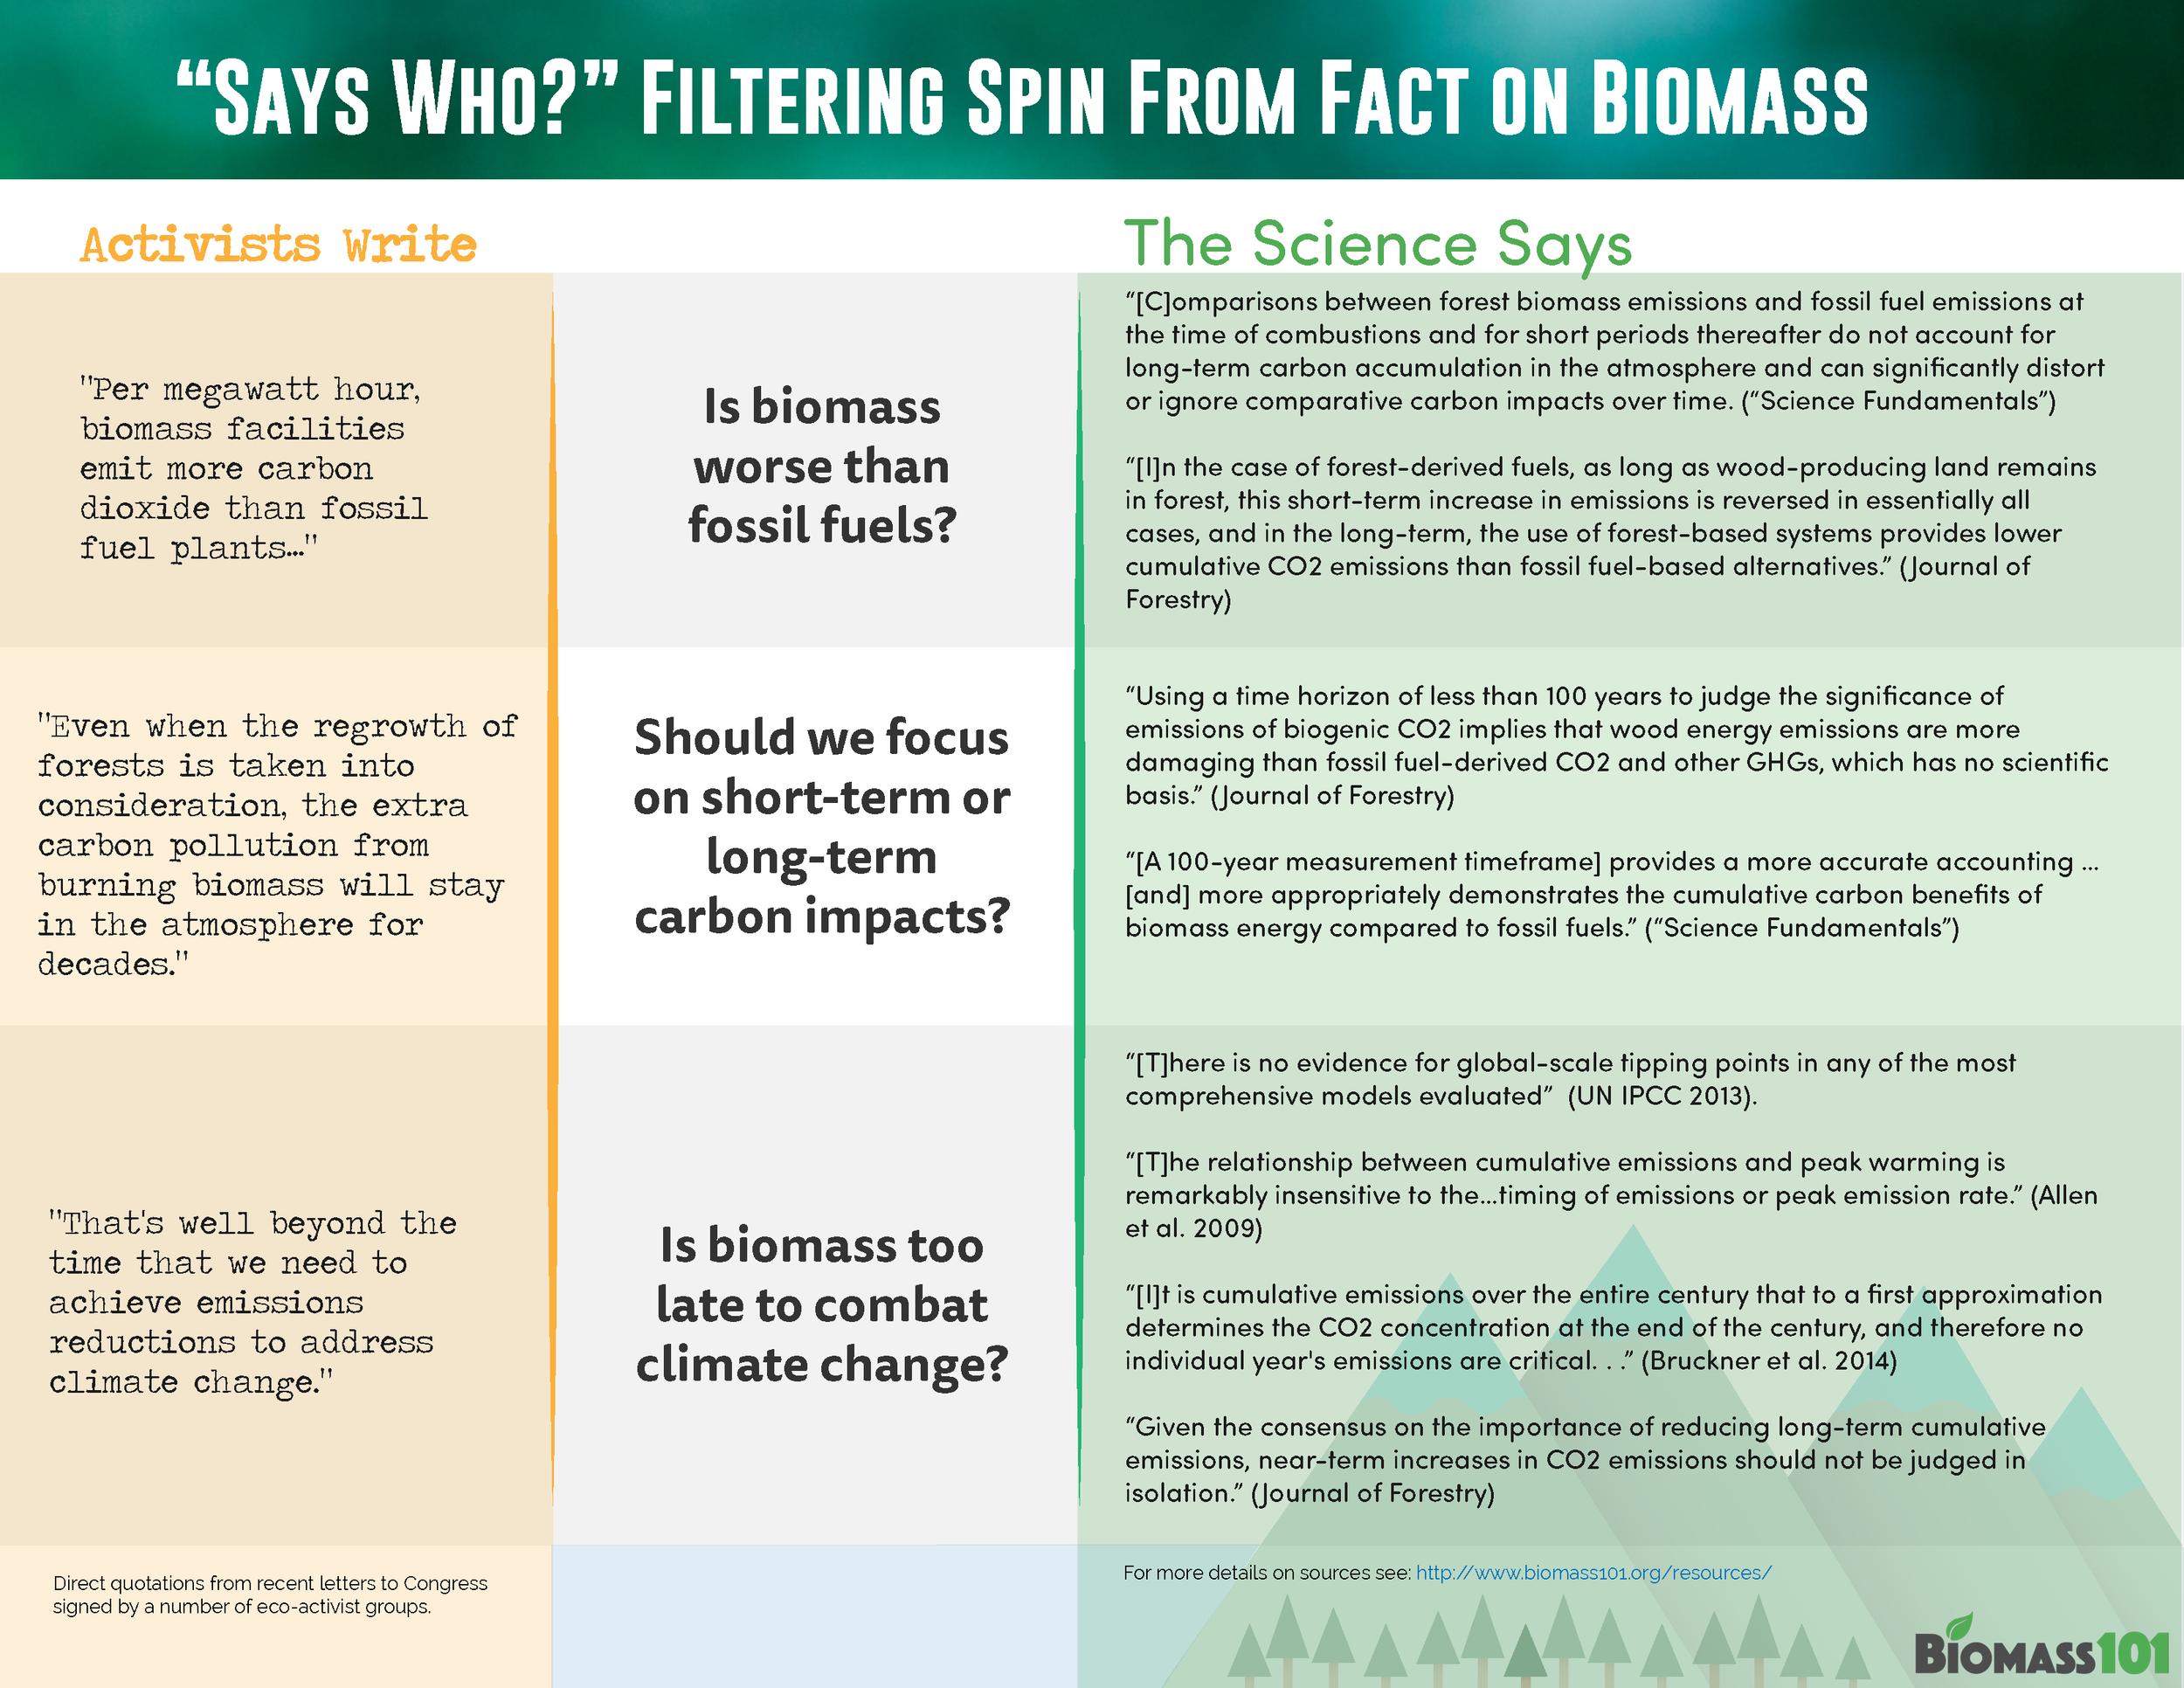 Media Accountability — Biomass101